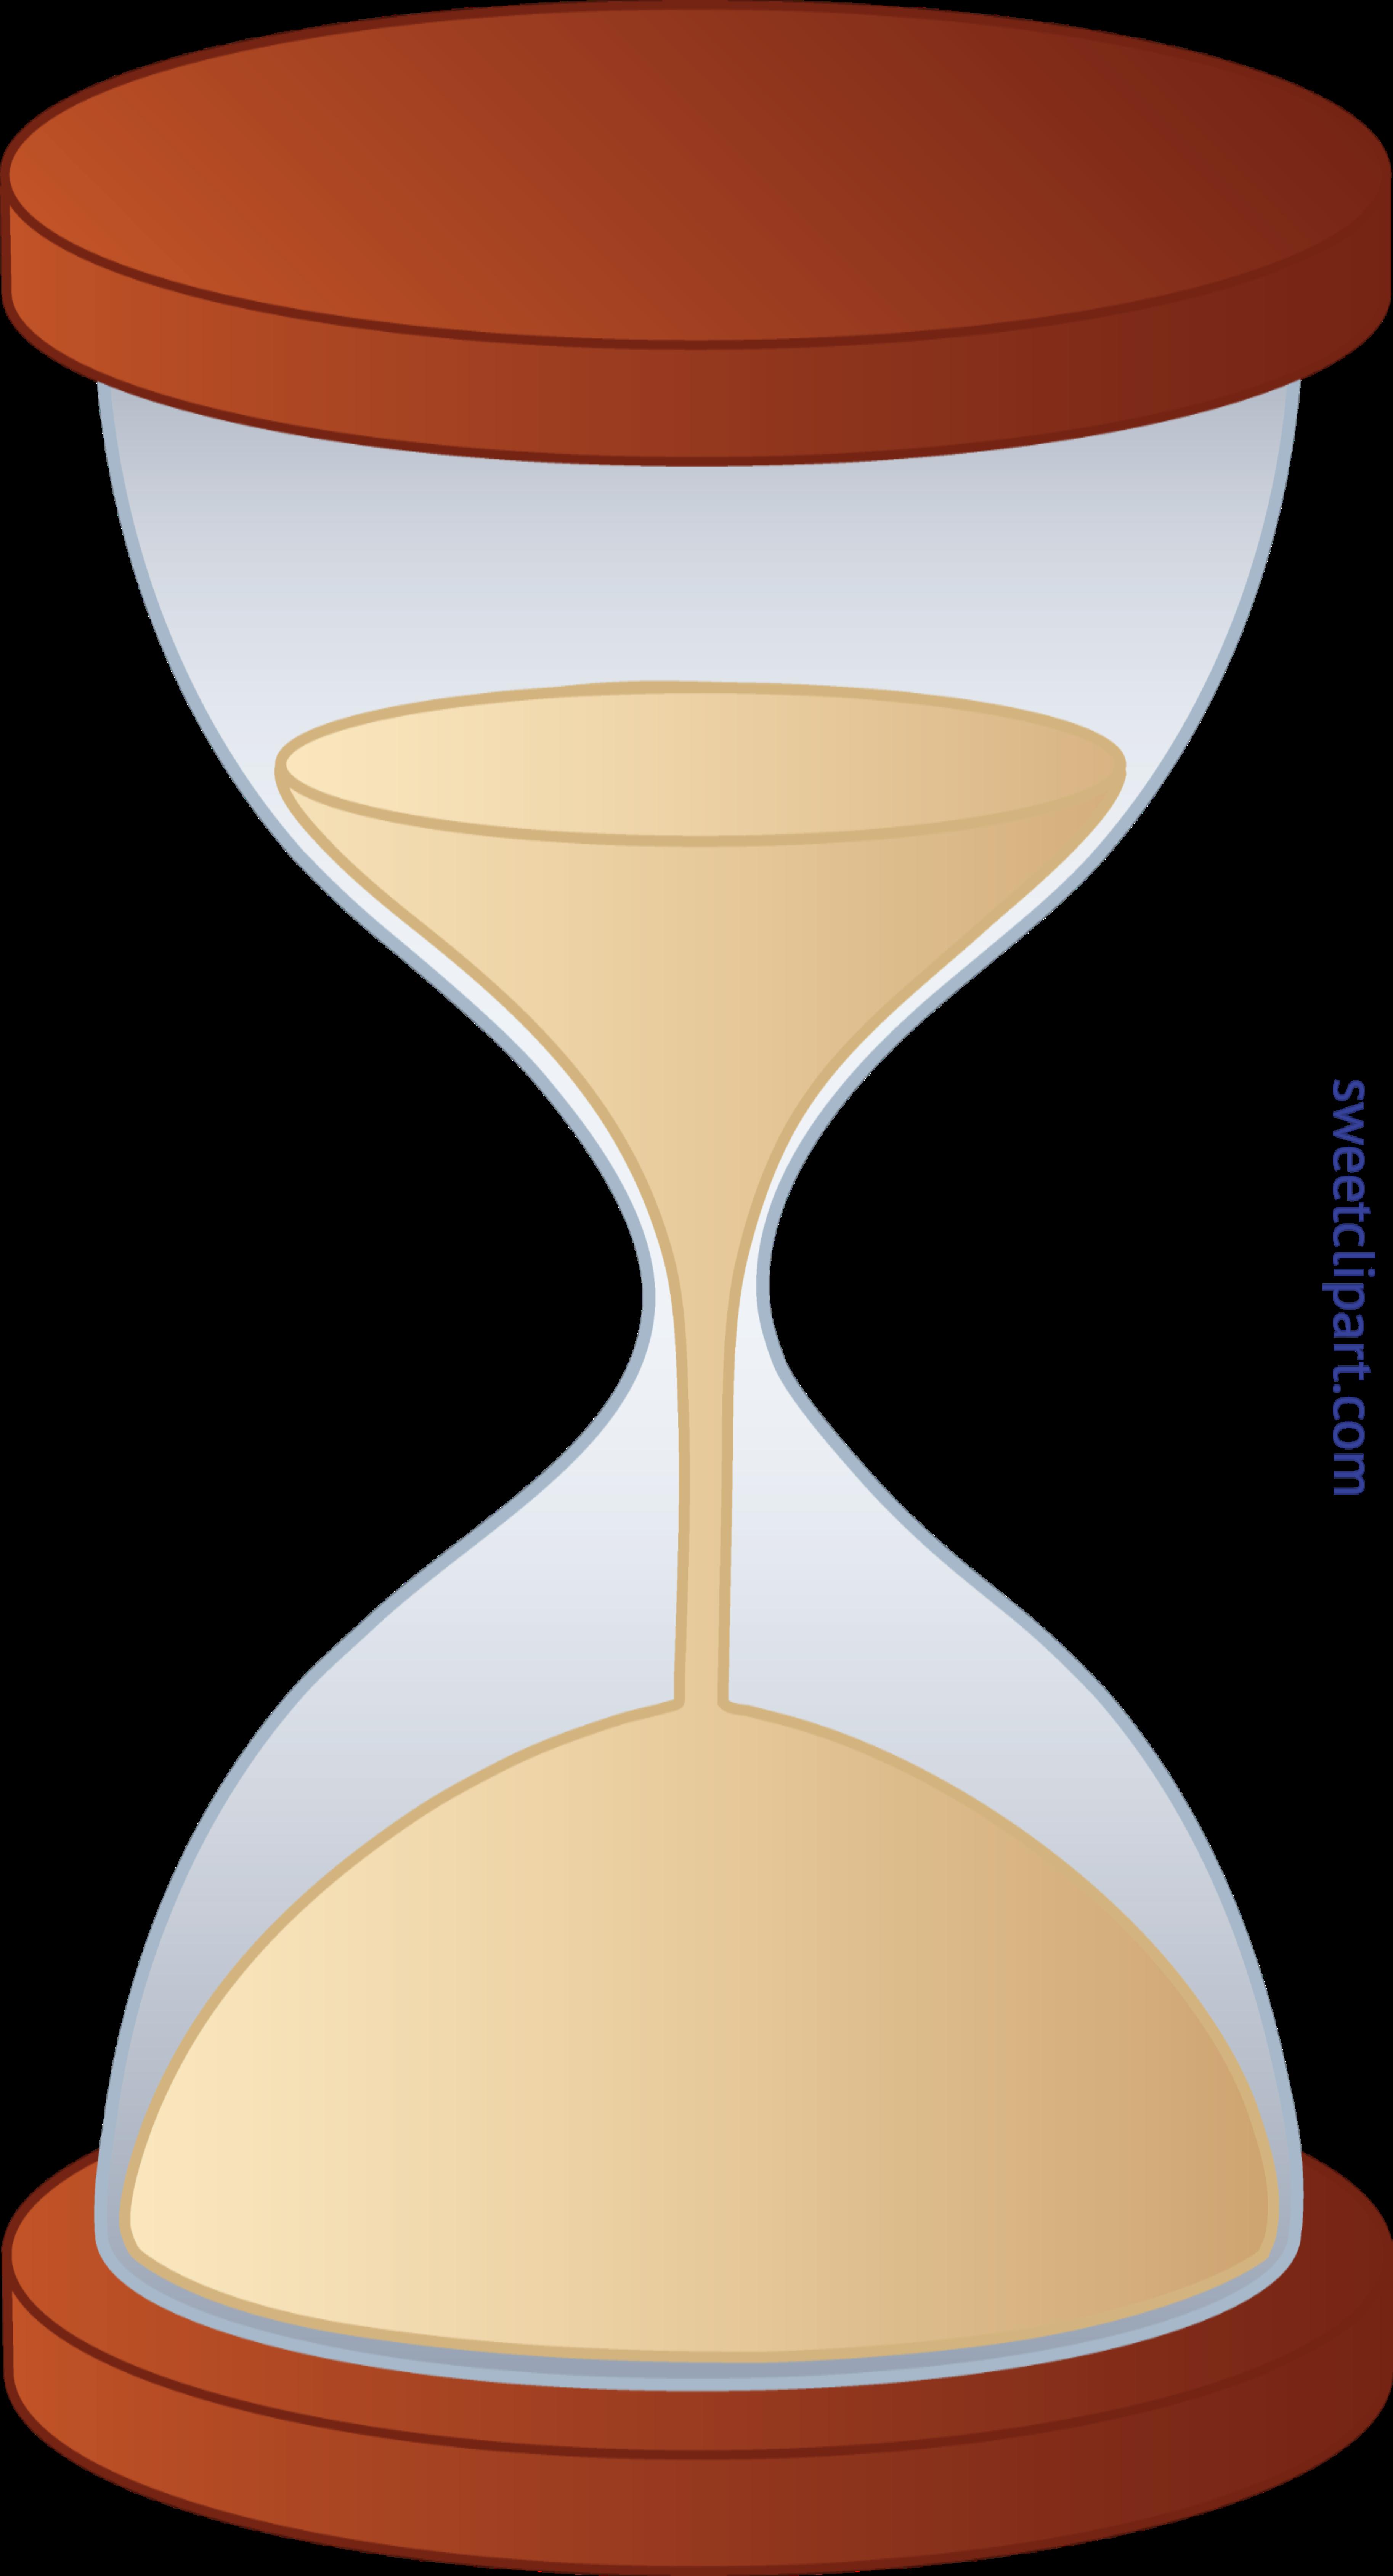 Clip art sweet. Hourglass clipart hour glass